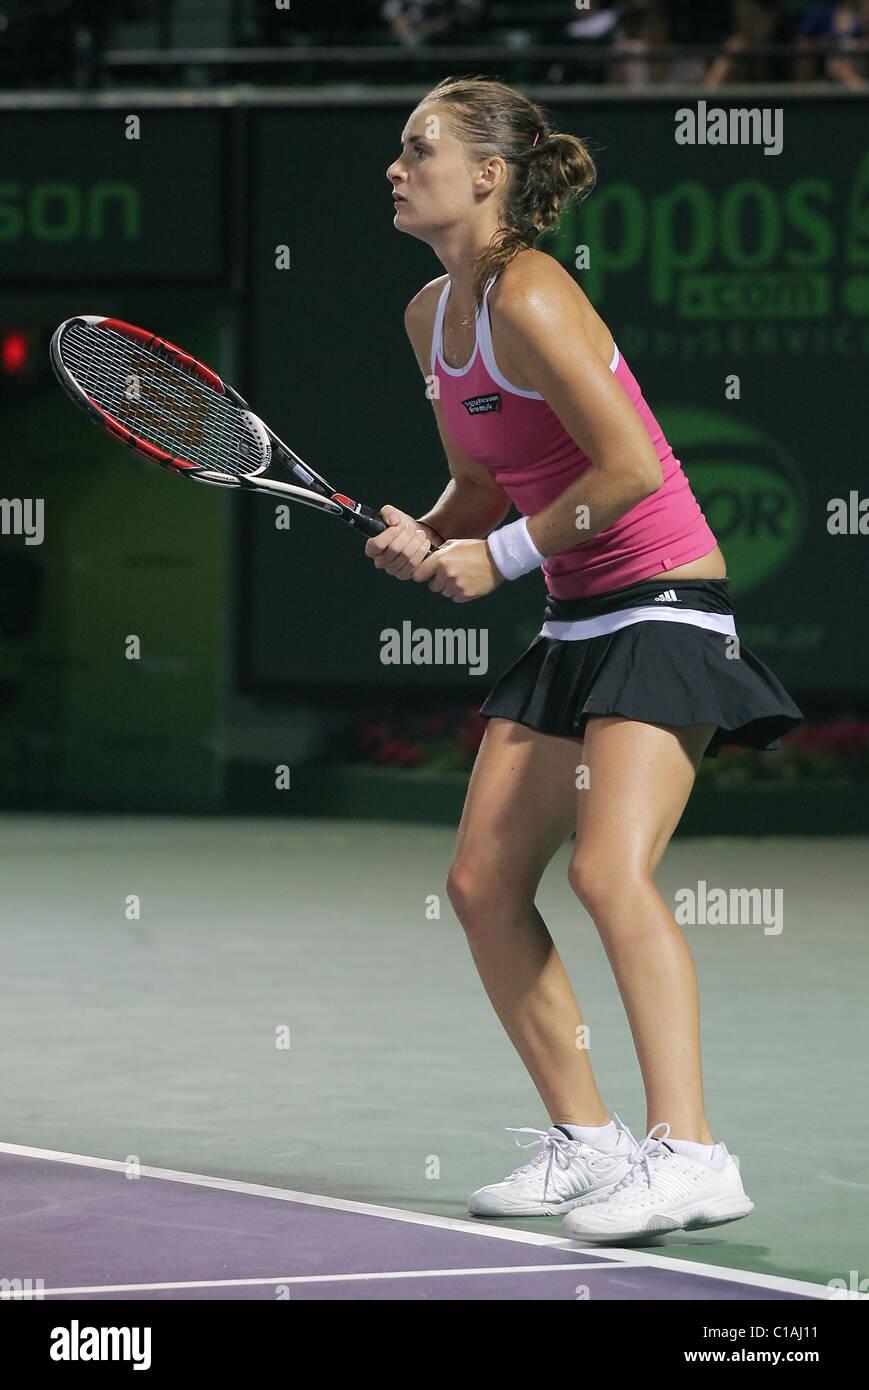 Czech tennis superstar, Iveta Benesova plays against Venus Williams on Day 10 of the Sony Ericsson Open Key Biscayne, - Stock Image